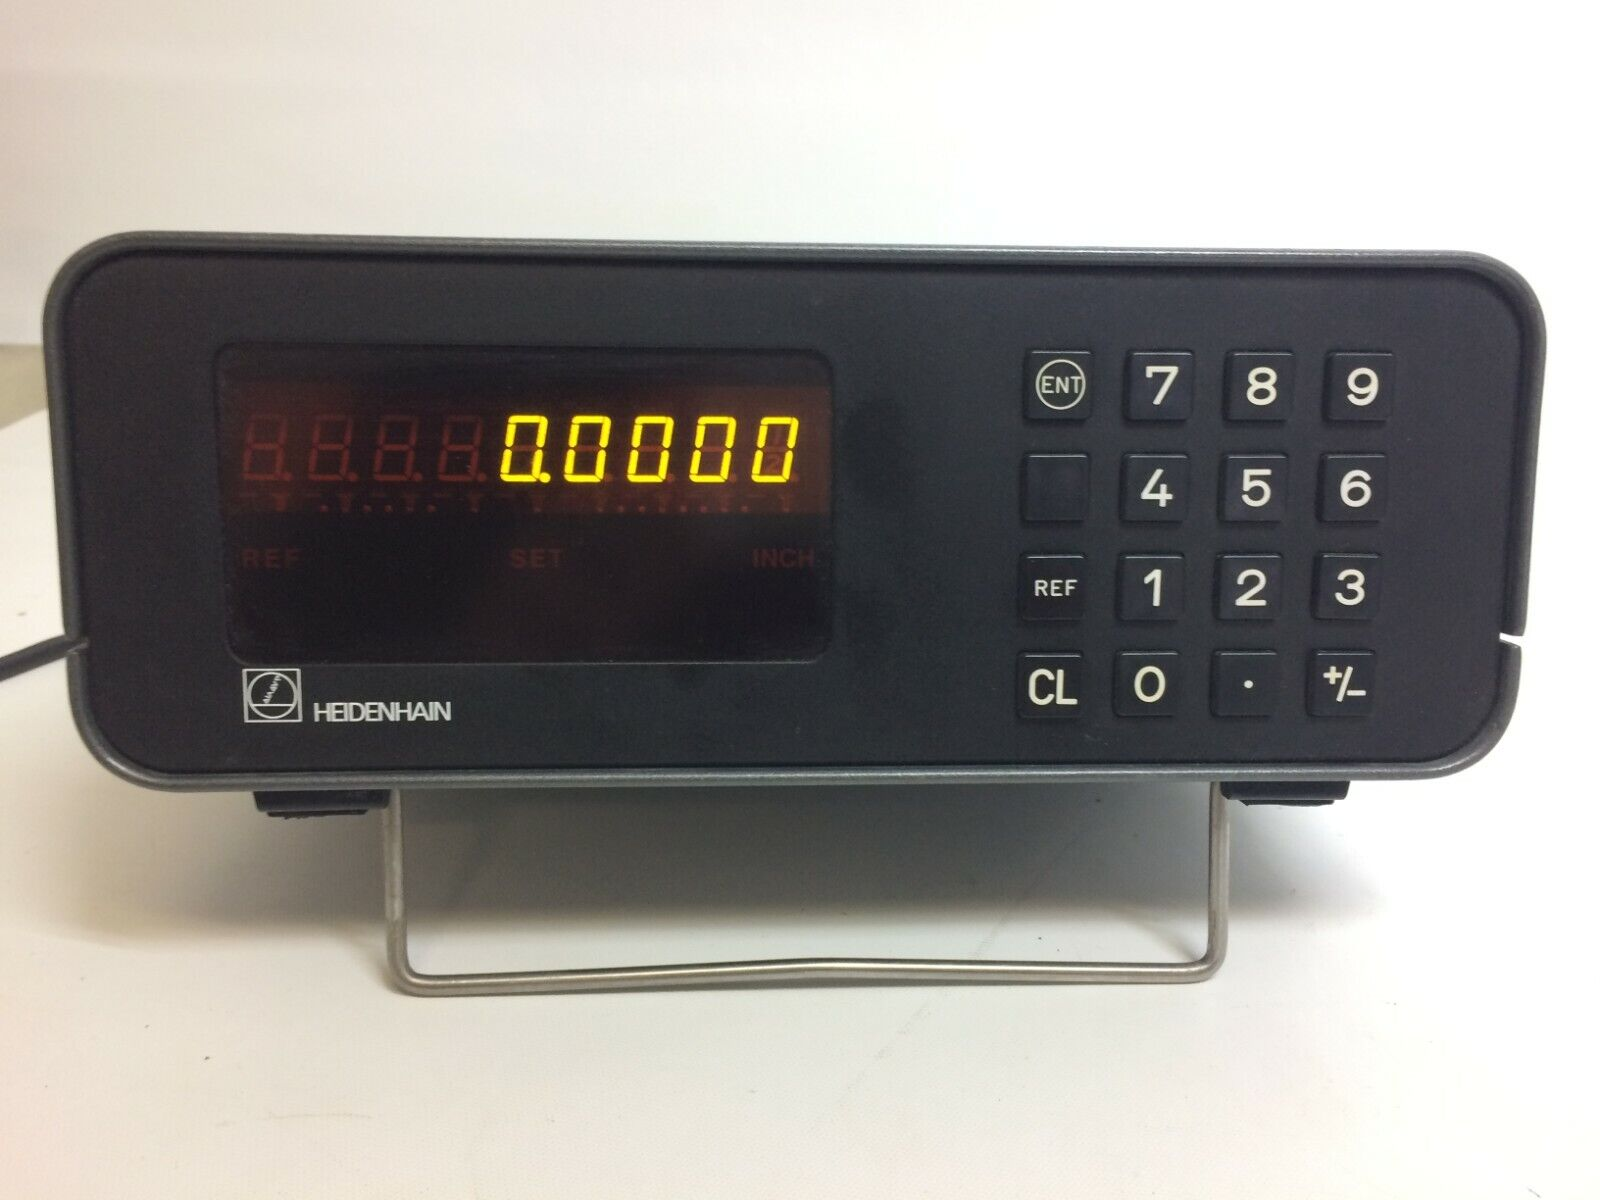 Heidenhain VRZ401 Digital Display Readout For Encoder  #230 645 03